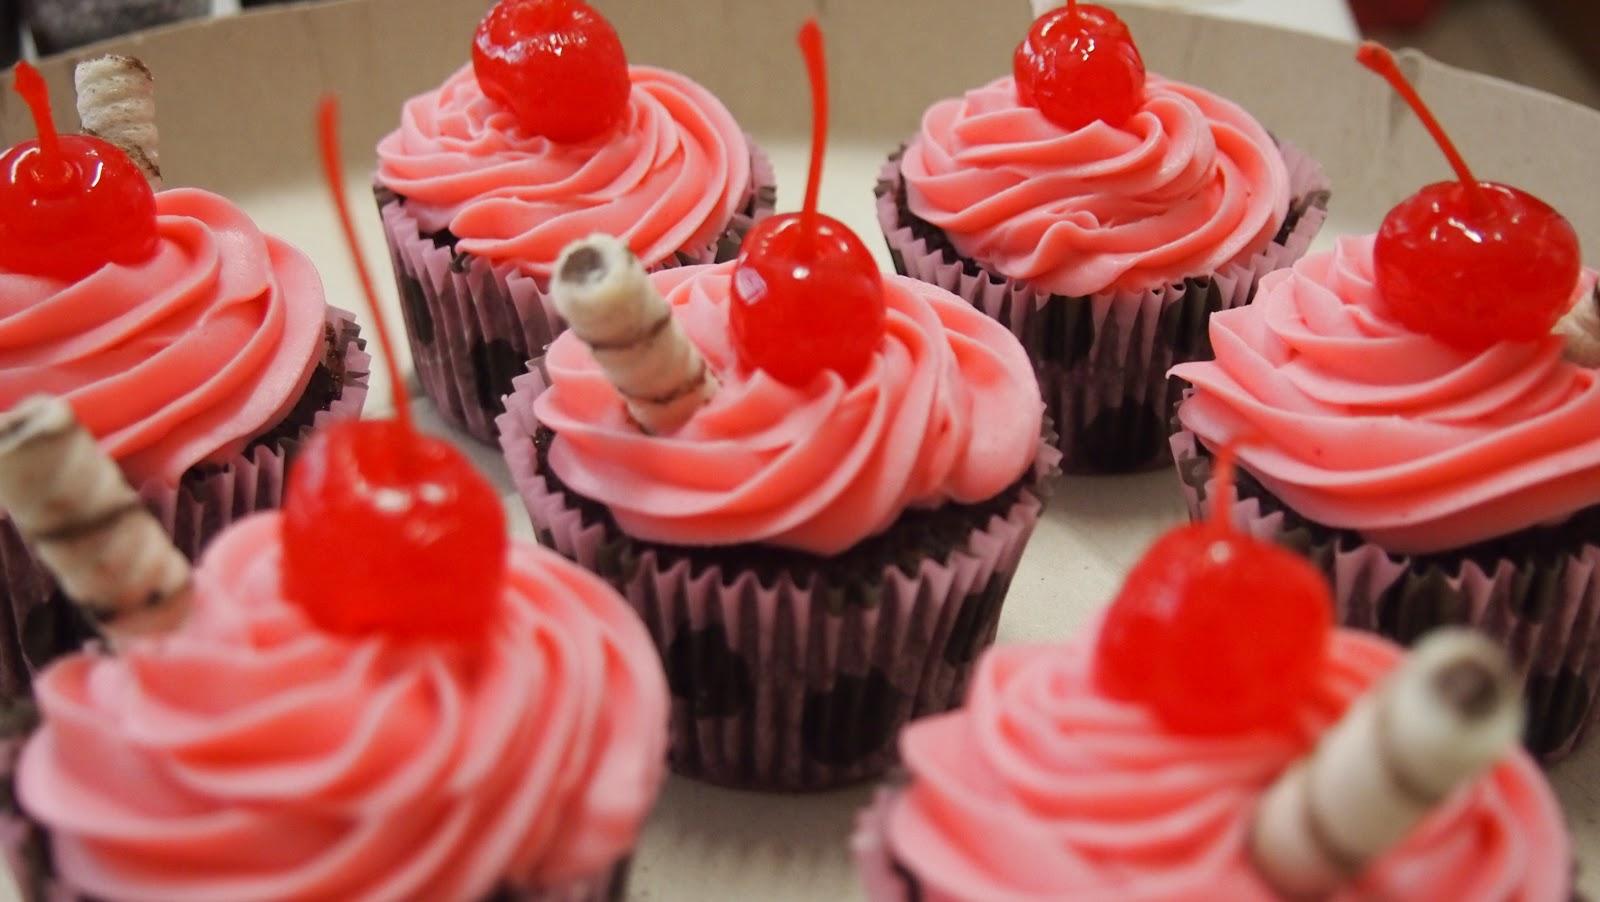 Elsa doces 19 98187 4830 boneca jolie cupcakes - Jolie cupcake ...